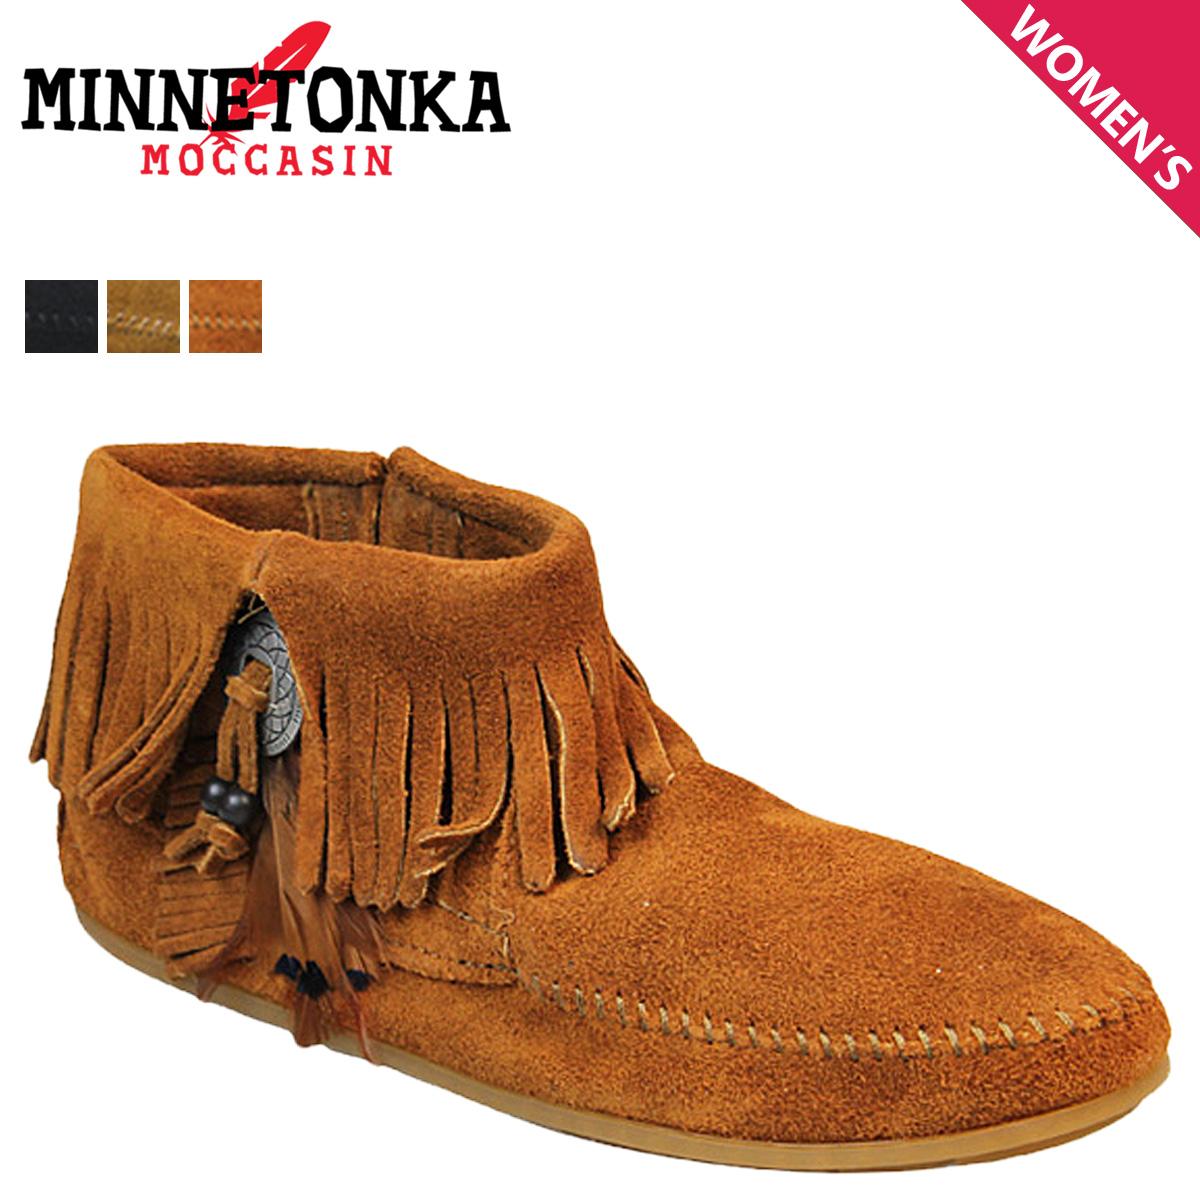 Sugar Online Shop | Rakuten Global Market: Minnetonka MINNETONKA Bootie Wiz コンチョフェザー サイドジップ boots BOOTSIE WITH CONCHO suede women's suede